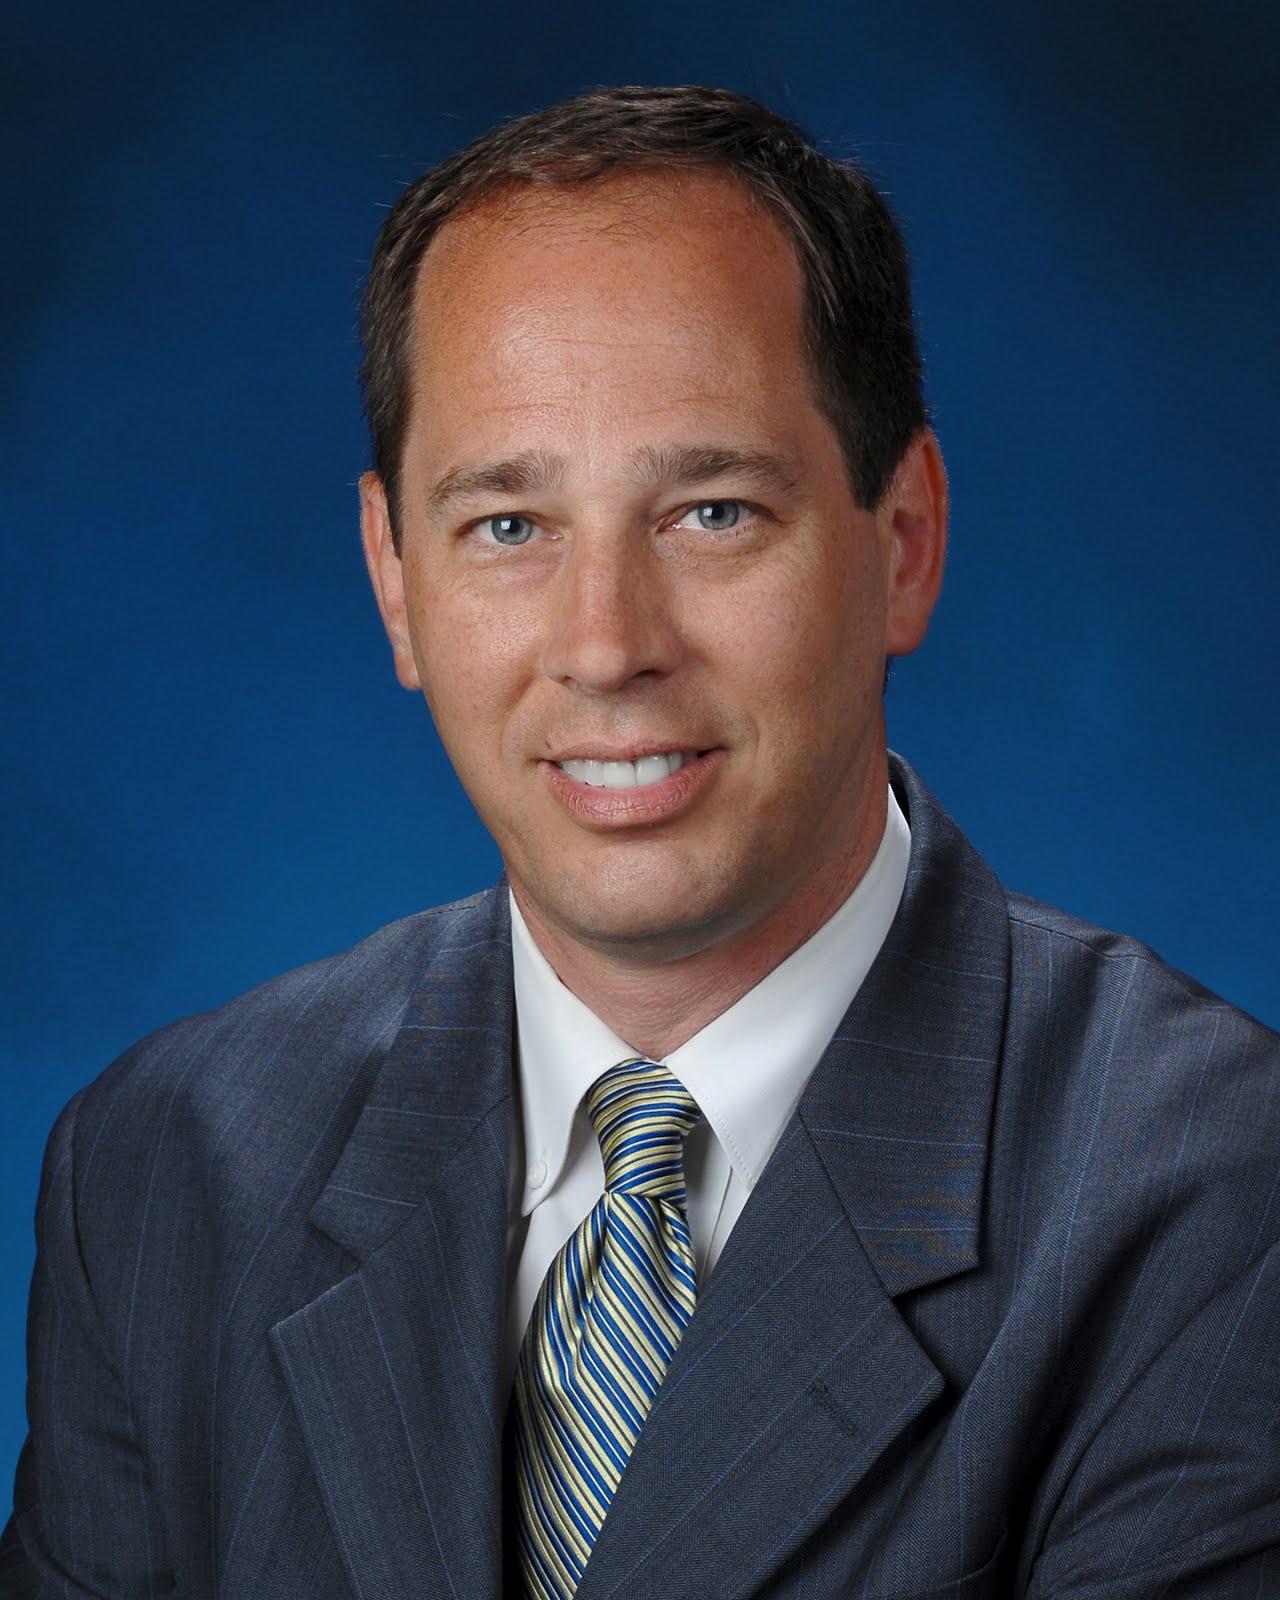 Joe Scarnati, State Senator, Pennsylvania